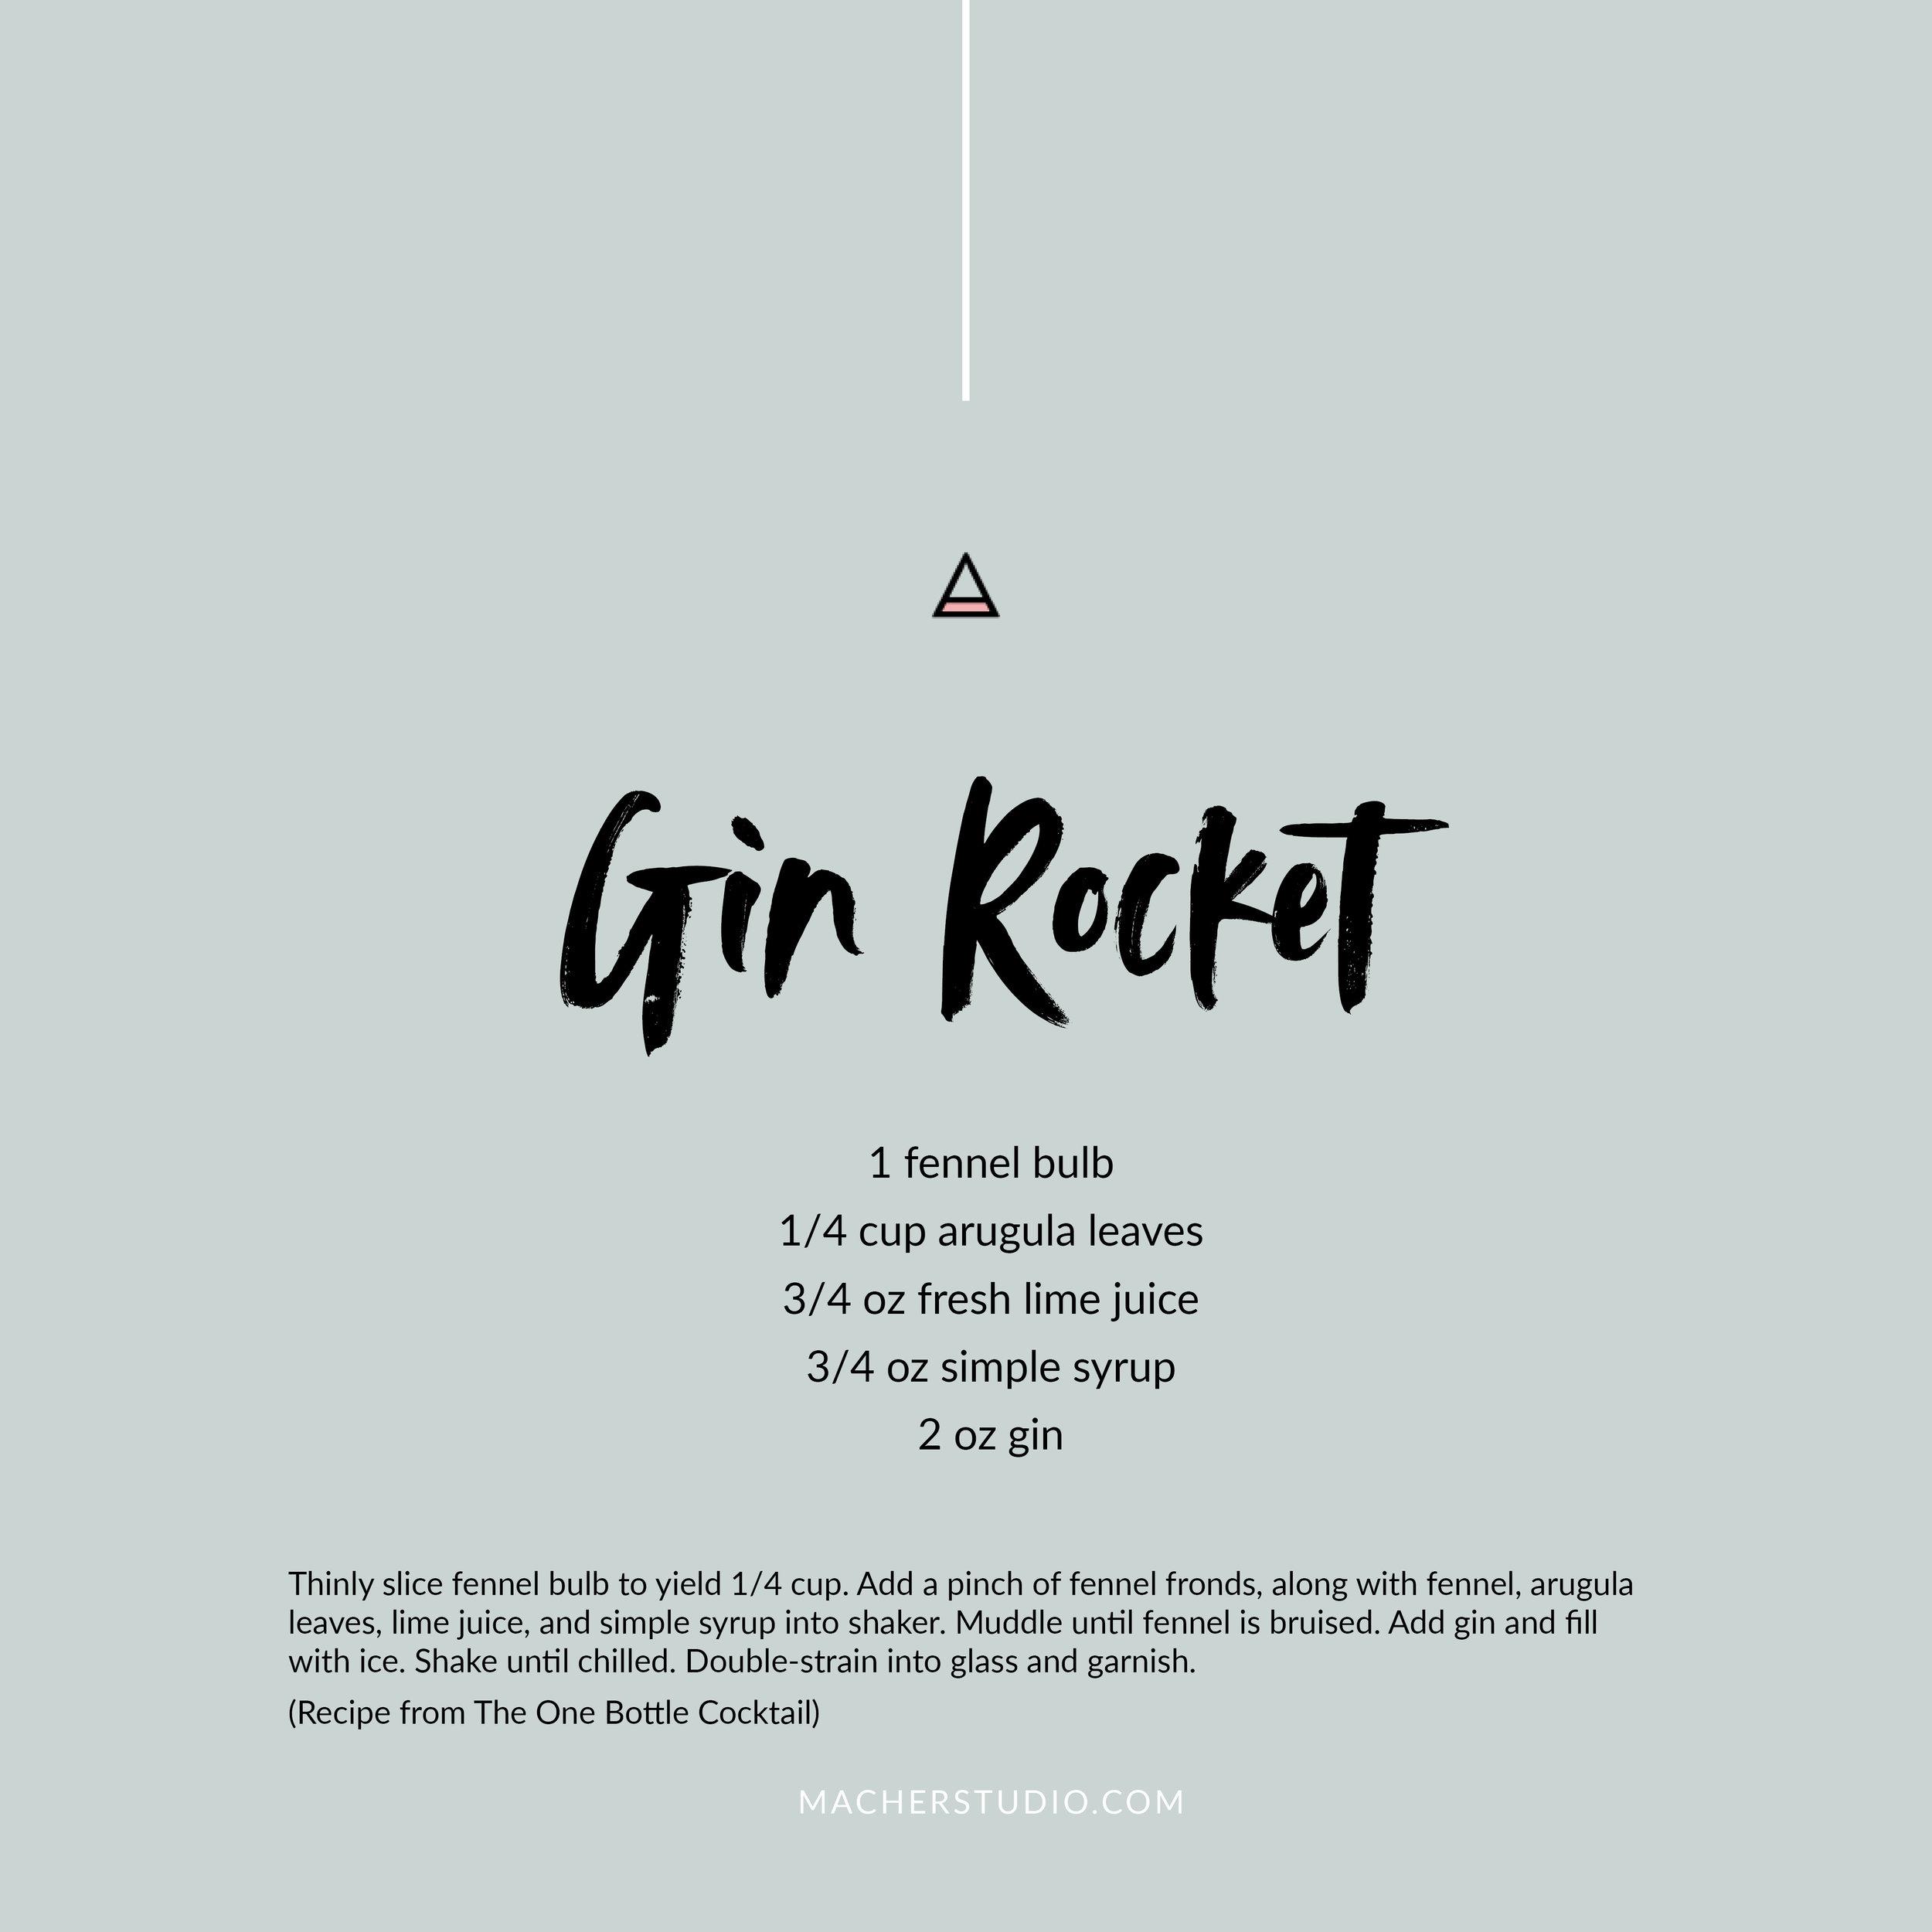 Macher_Backwards_Gin-Rocket.jpg